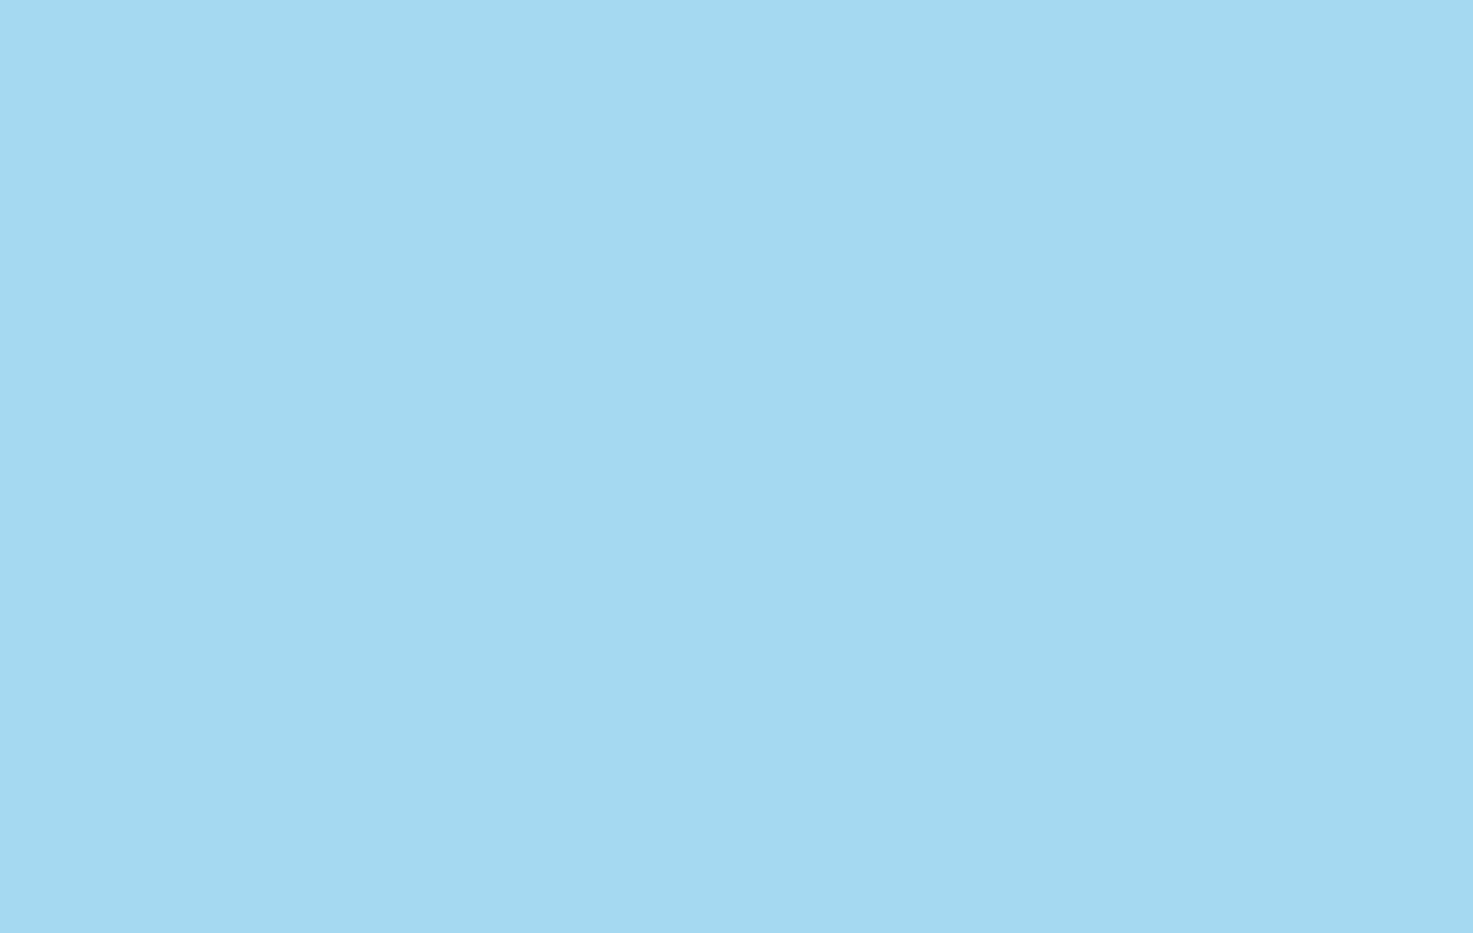 azzurro 546